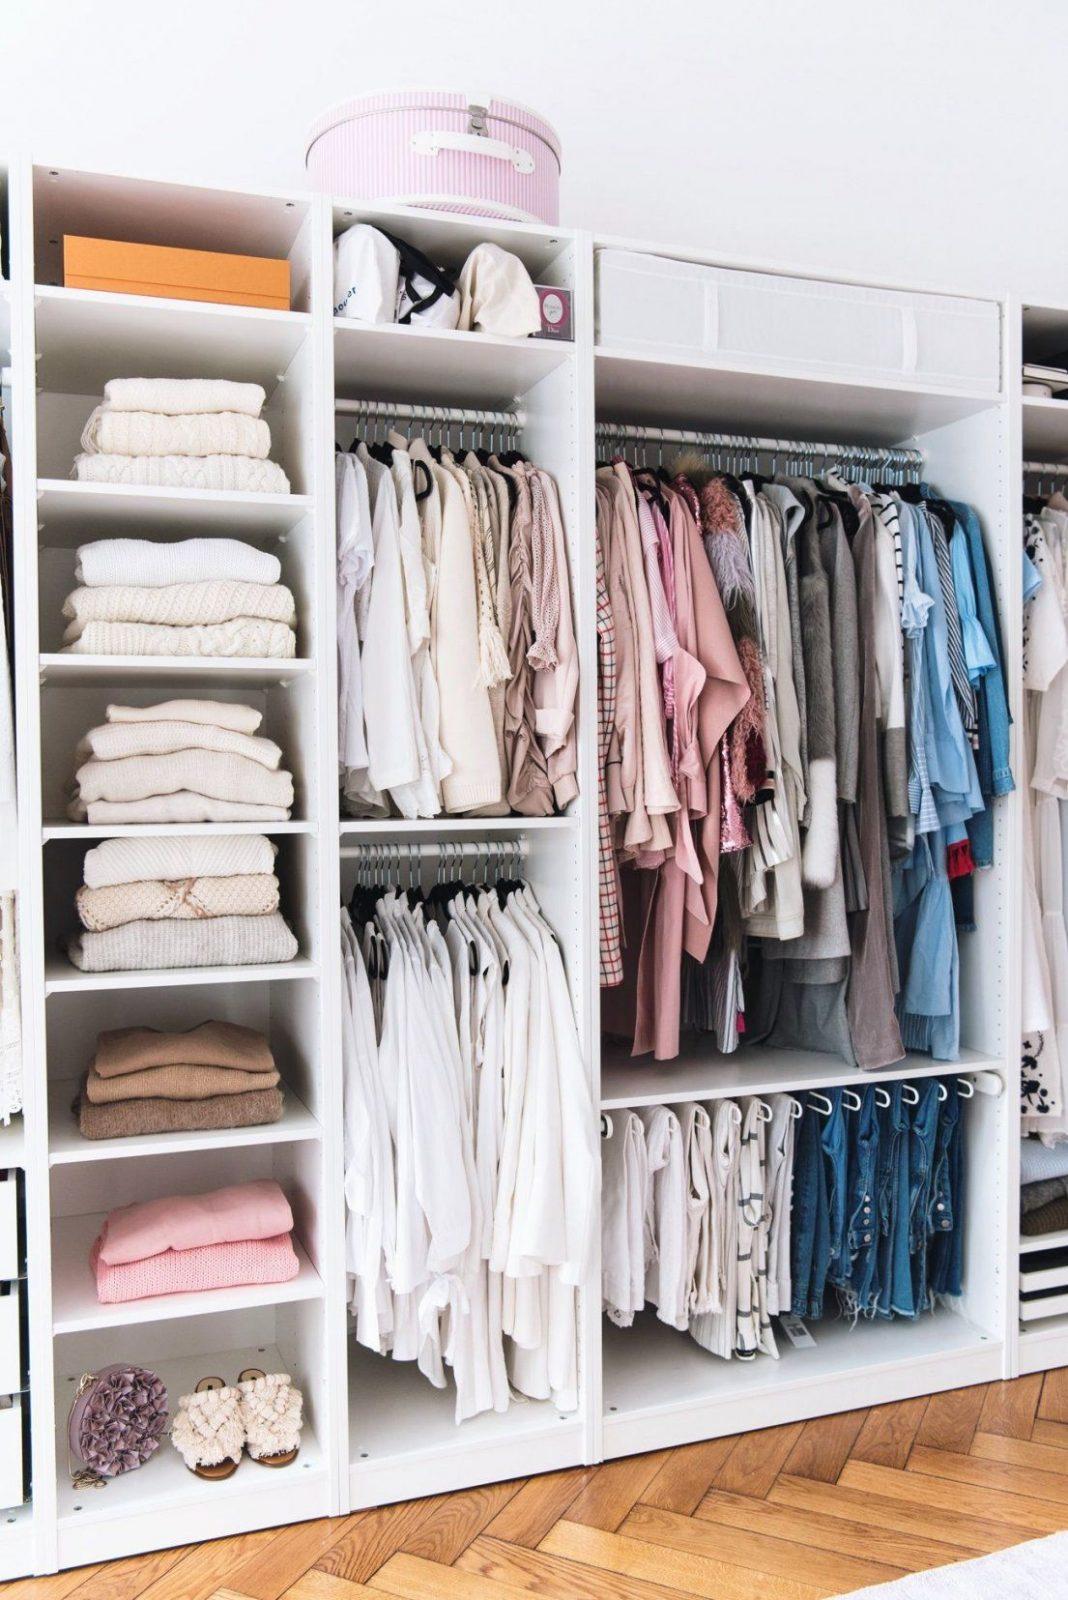 Mein Begehbarer Kleiderschrank  Doors Inloopkast En Slaapkamer von Begehbarer Kleiderschrank Ikea Pax Bild